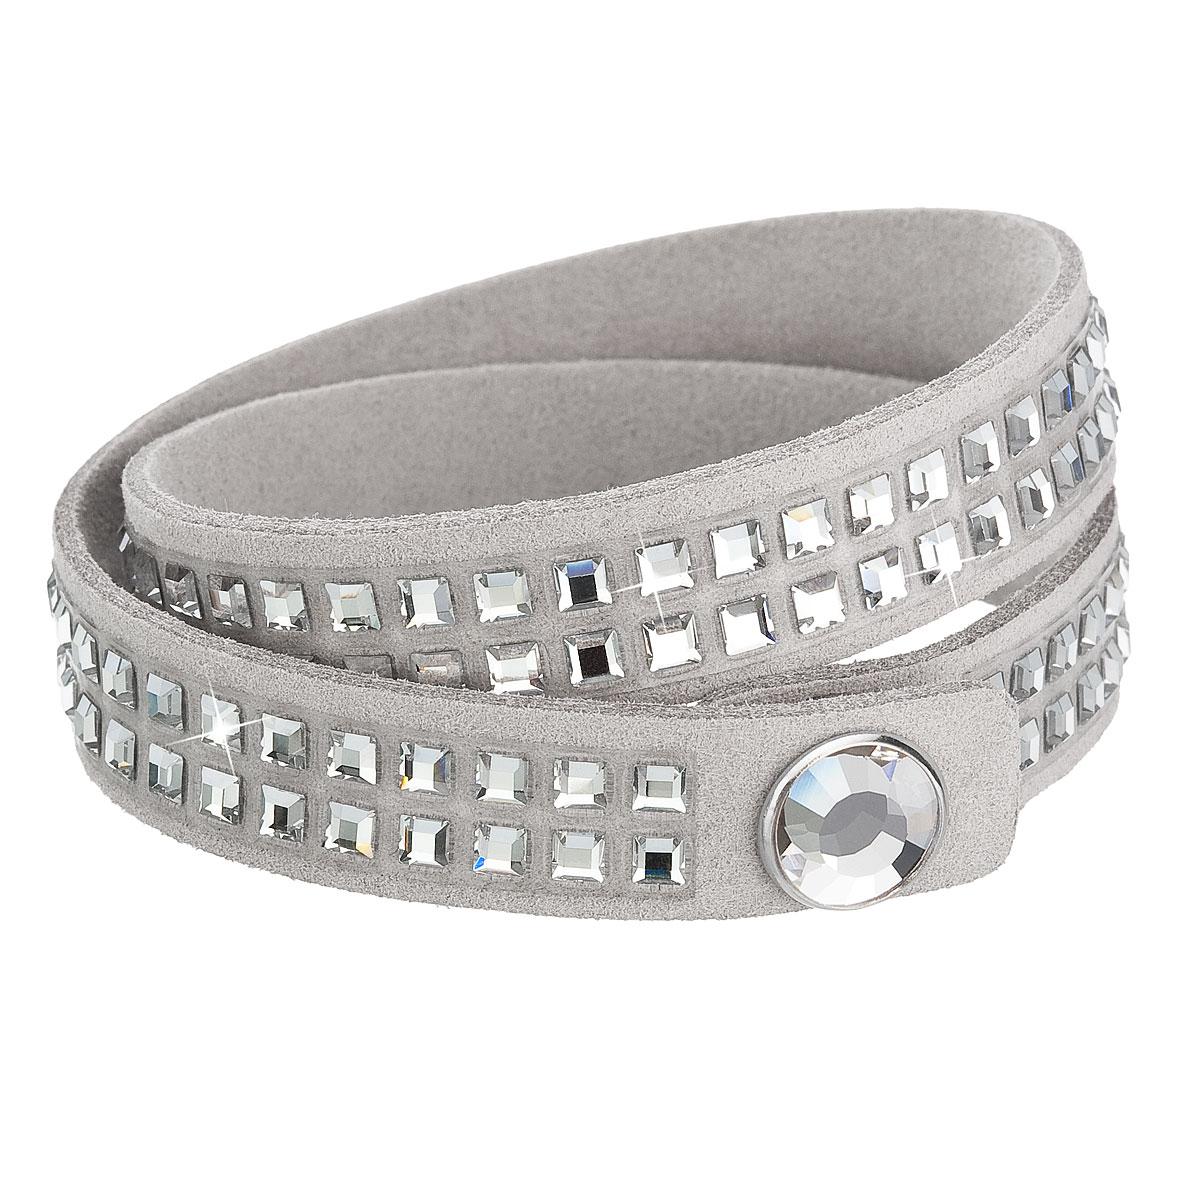 Náramek dvouřadý bižuterie s krystaly šedý 33083.1